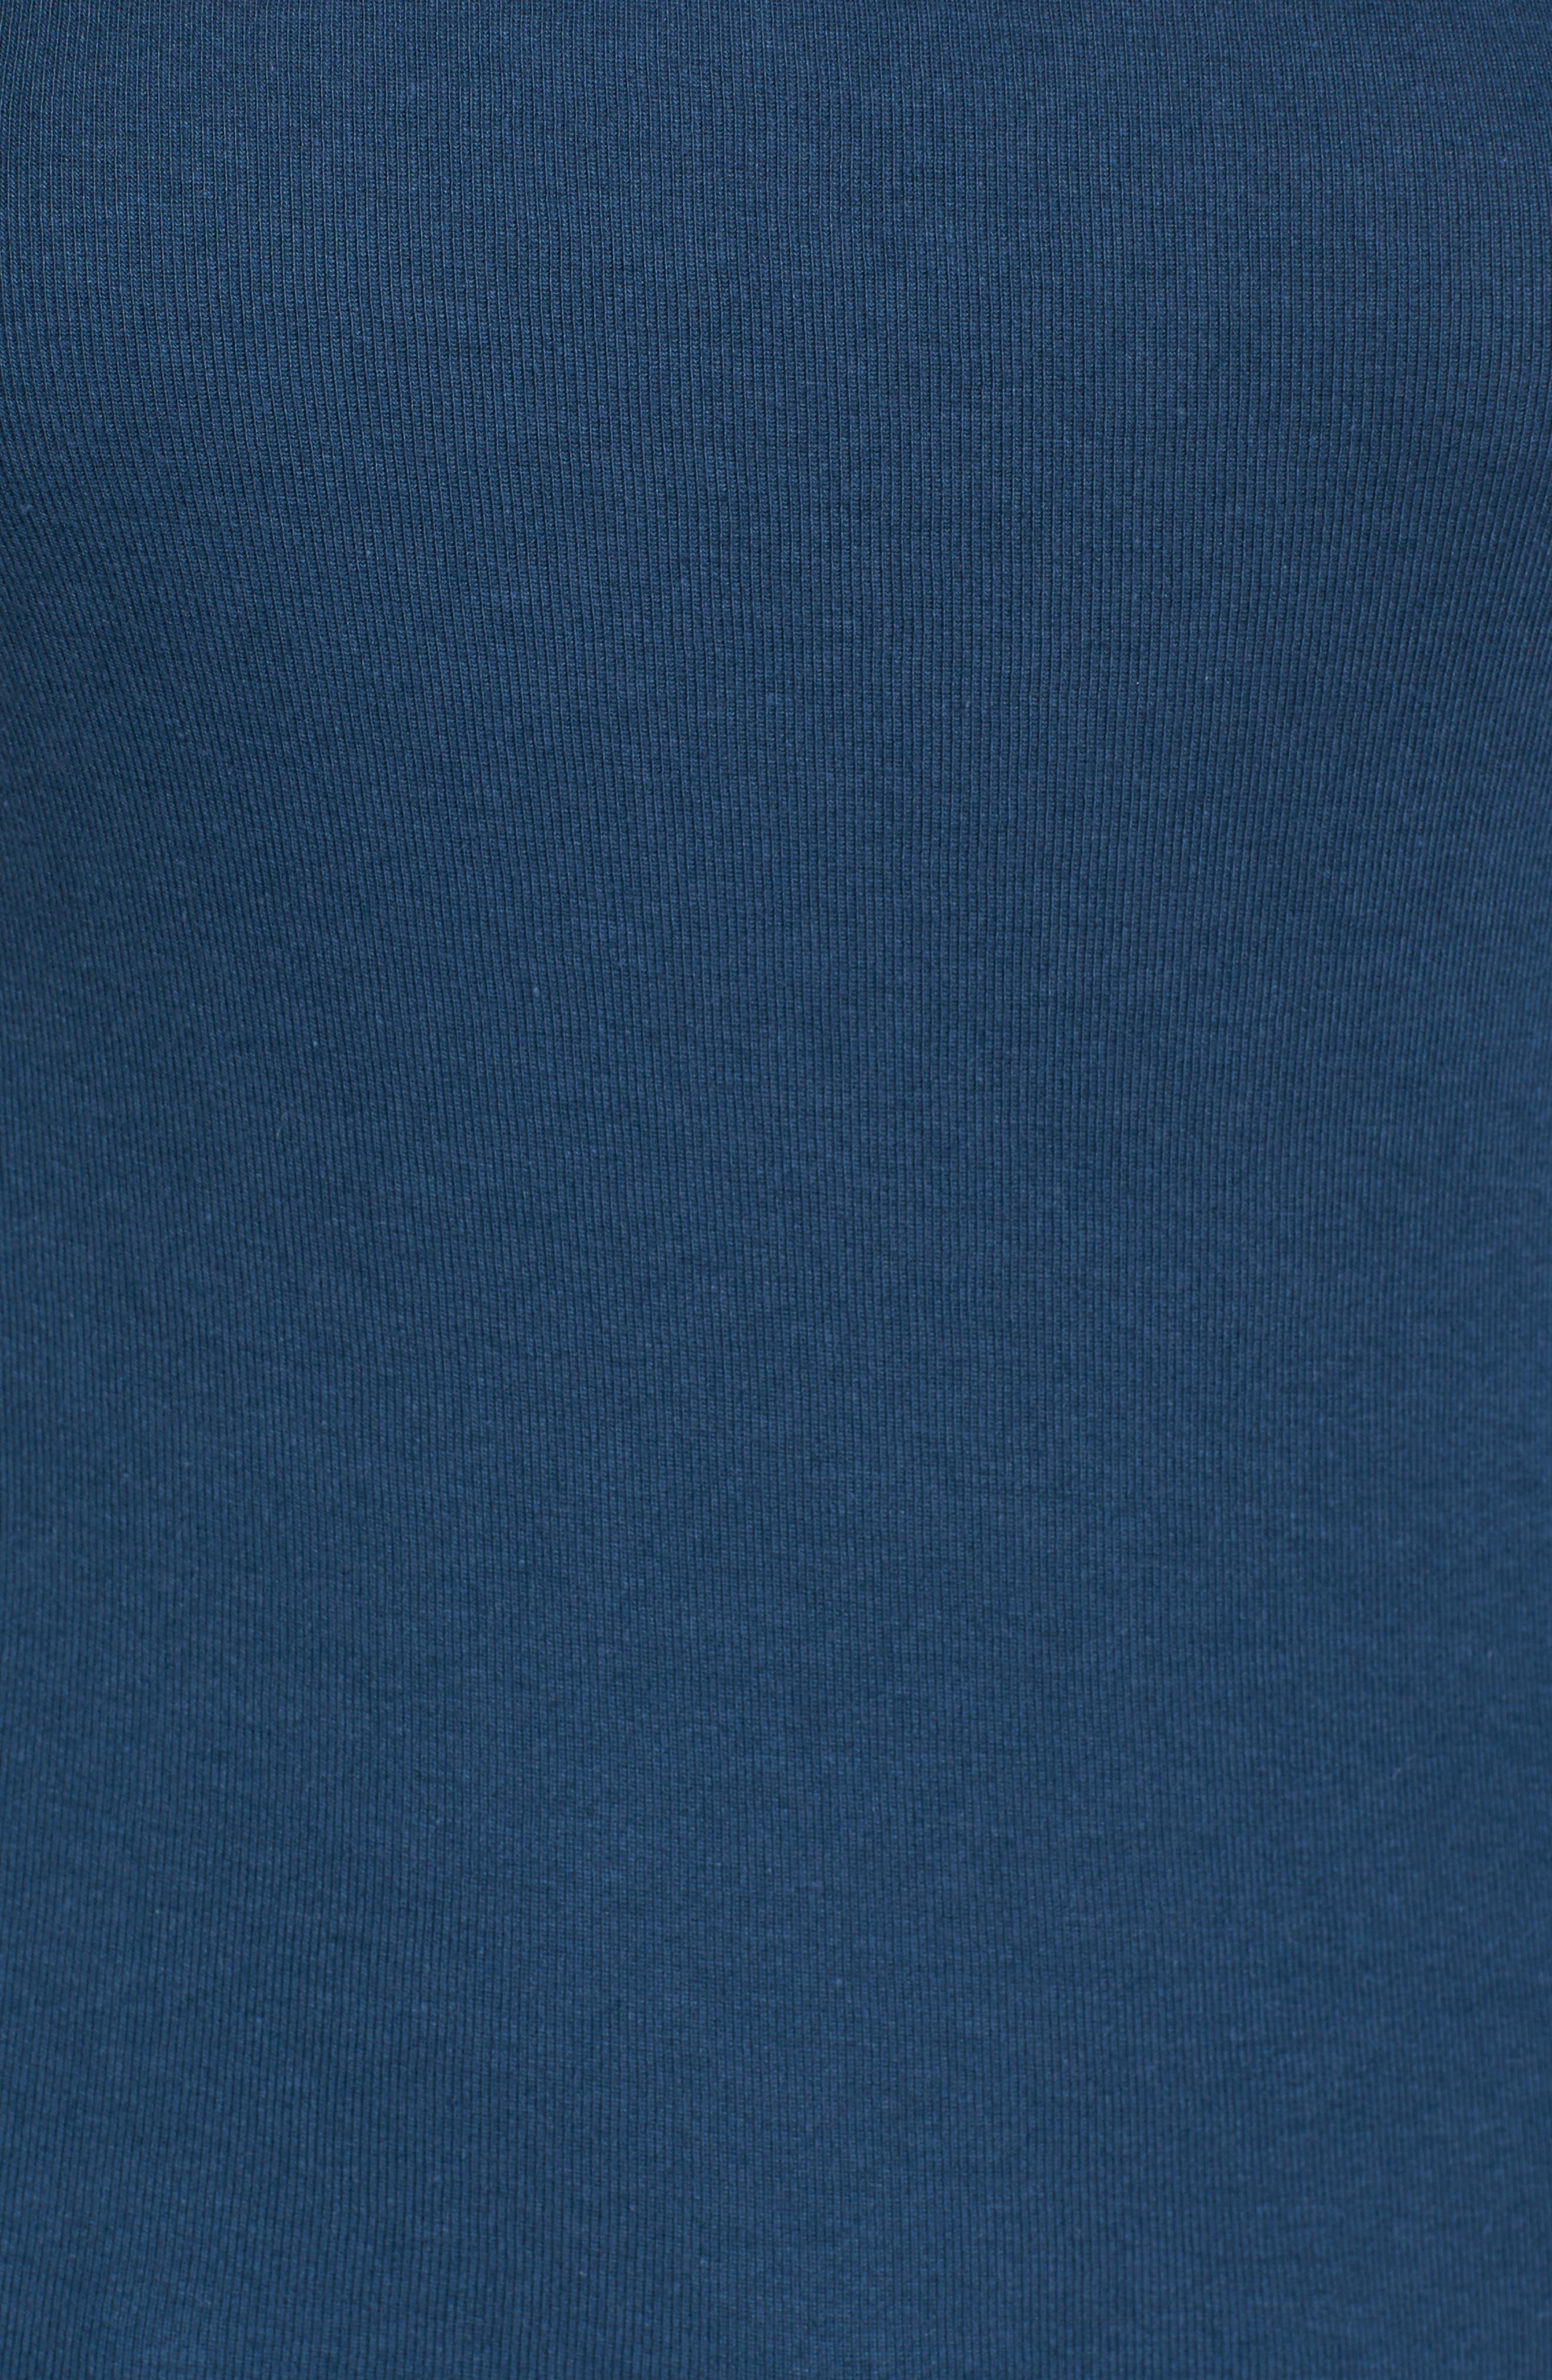 Three Quarter Sleeve Tee,                             Alternate thumbnail 6, color,                             Blue Wing